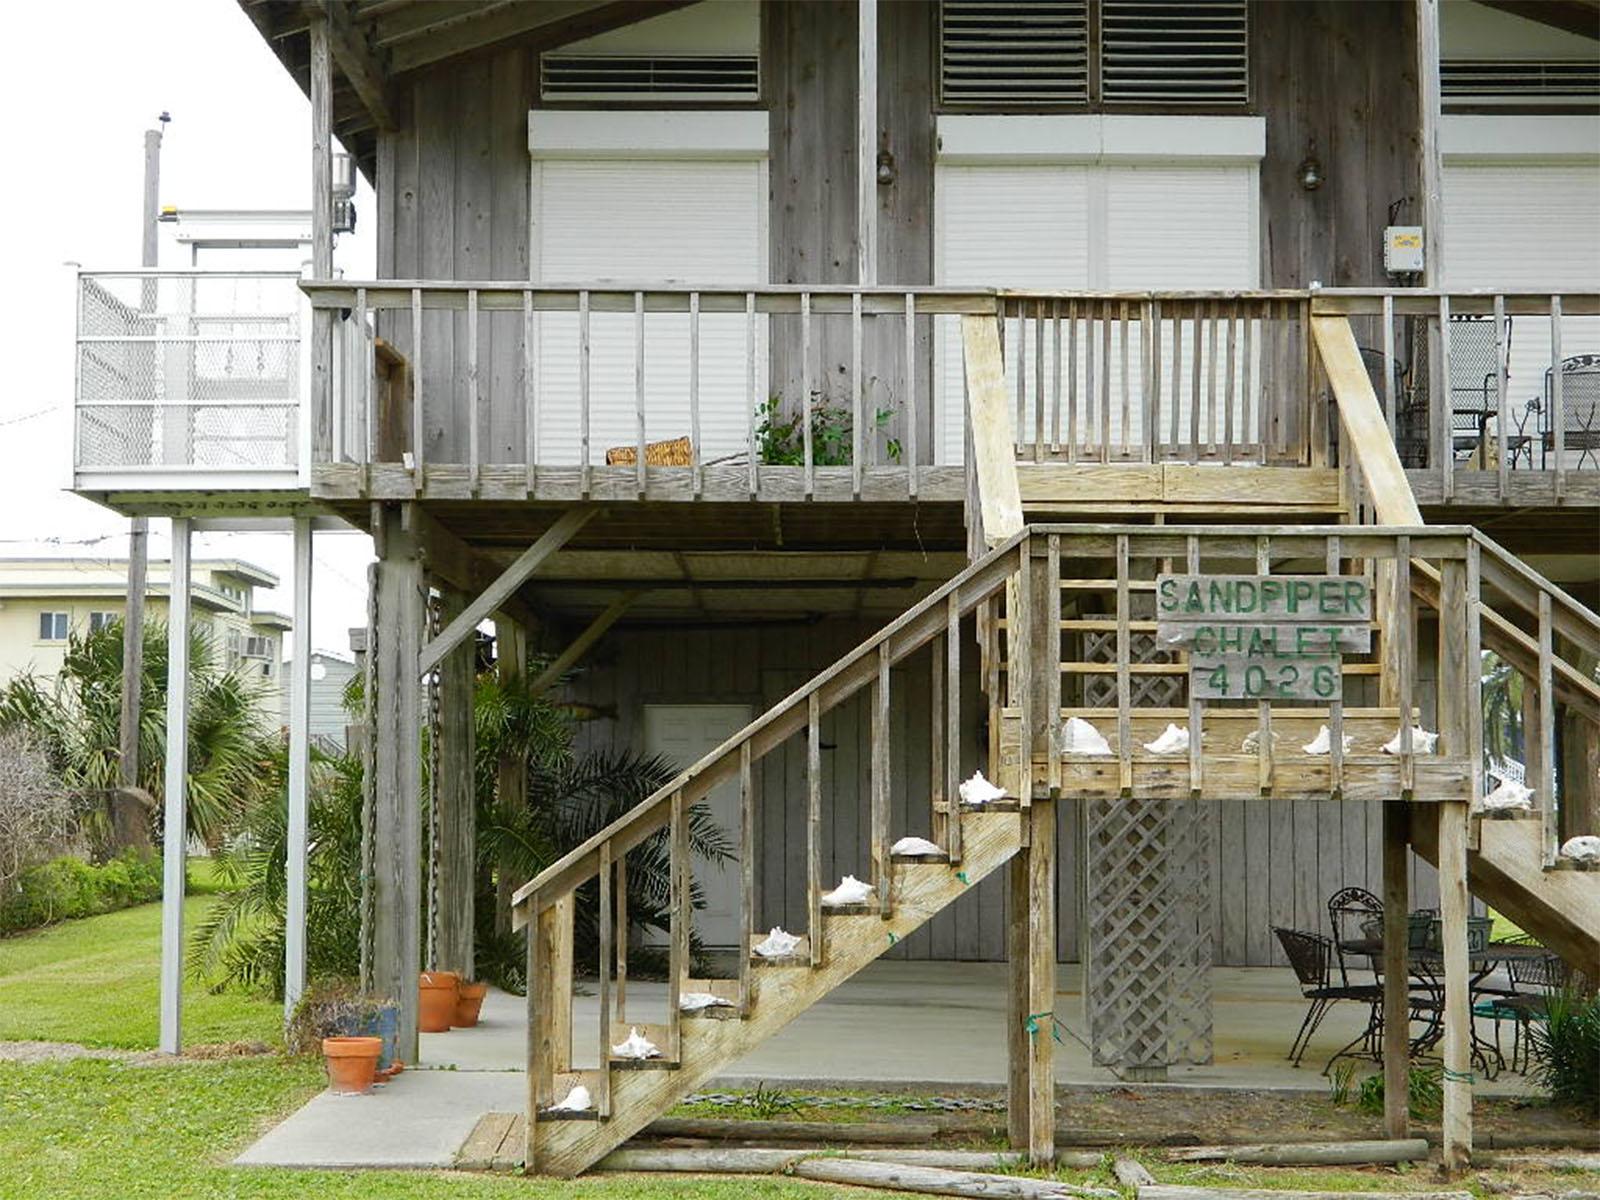 22 beach house lifts ideas home building plans 24856 Beach house lifts